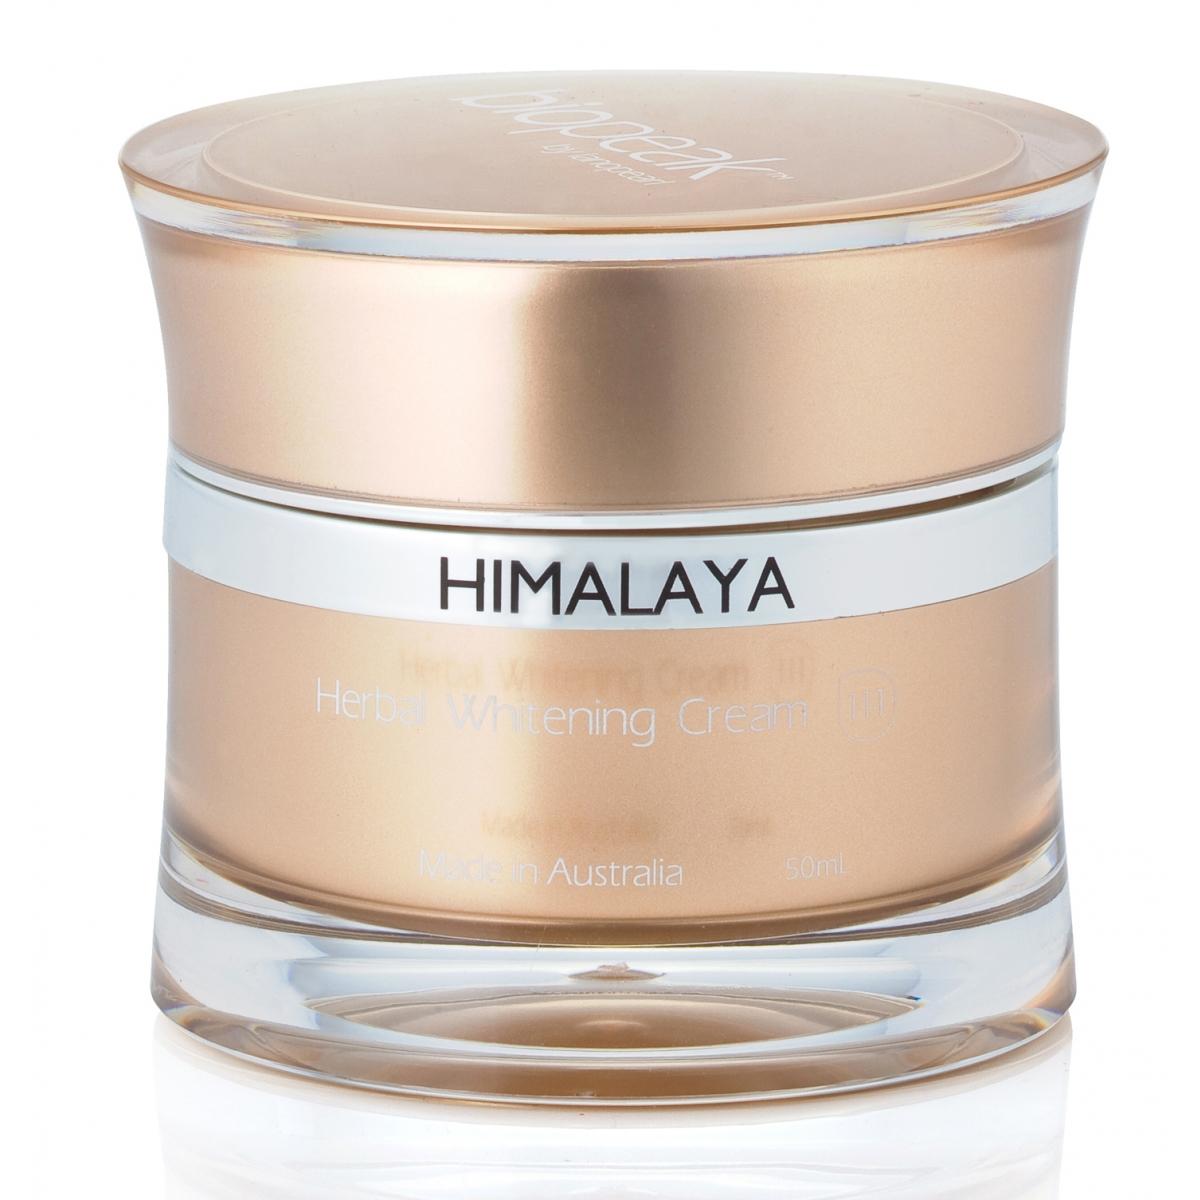 Skin Care Cream: Himalaya Herbal Whitening Cream (LB34N) 50mL